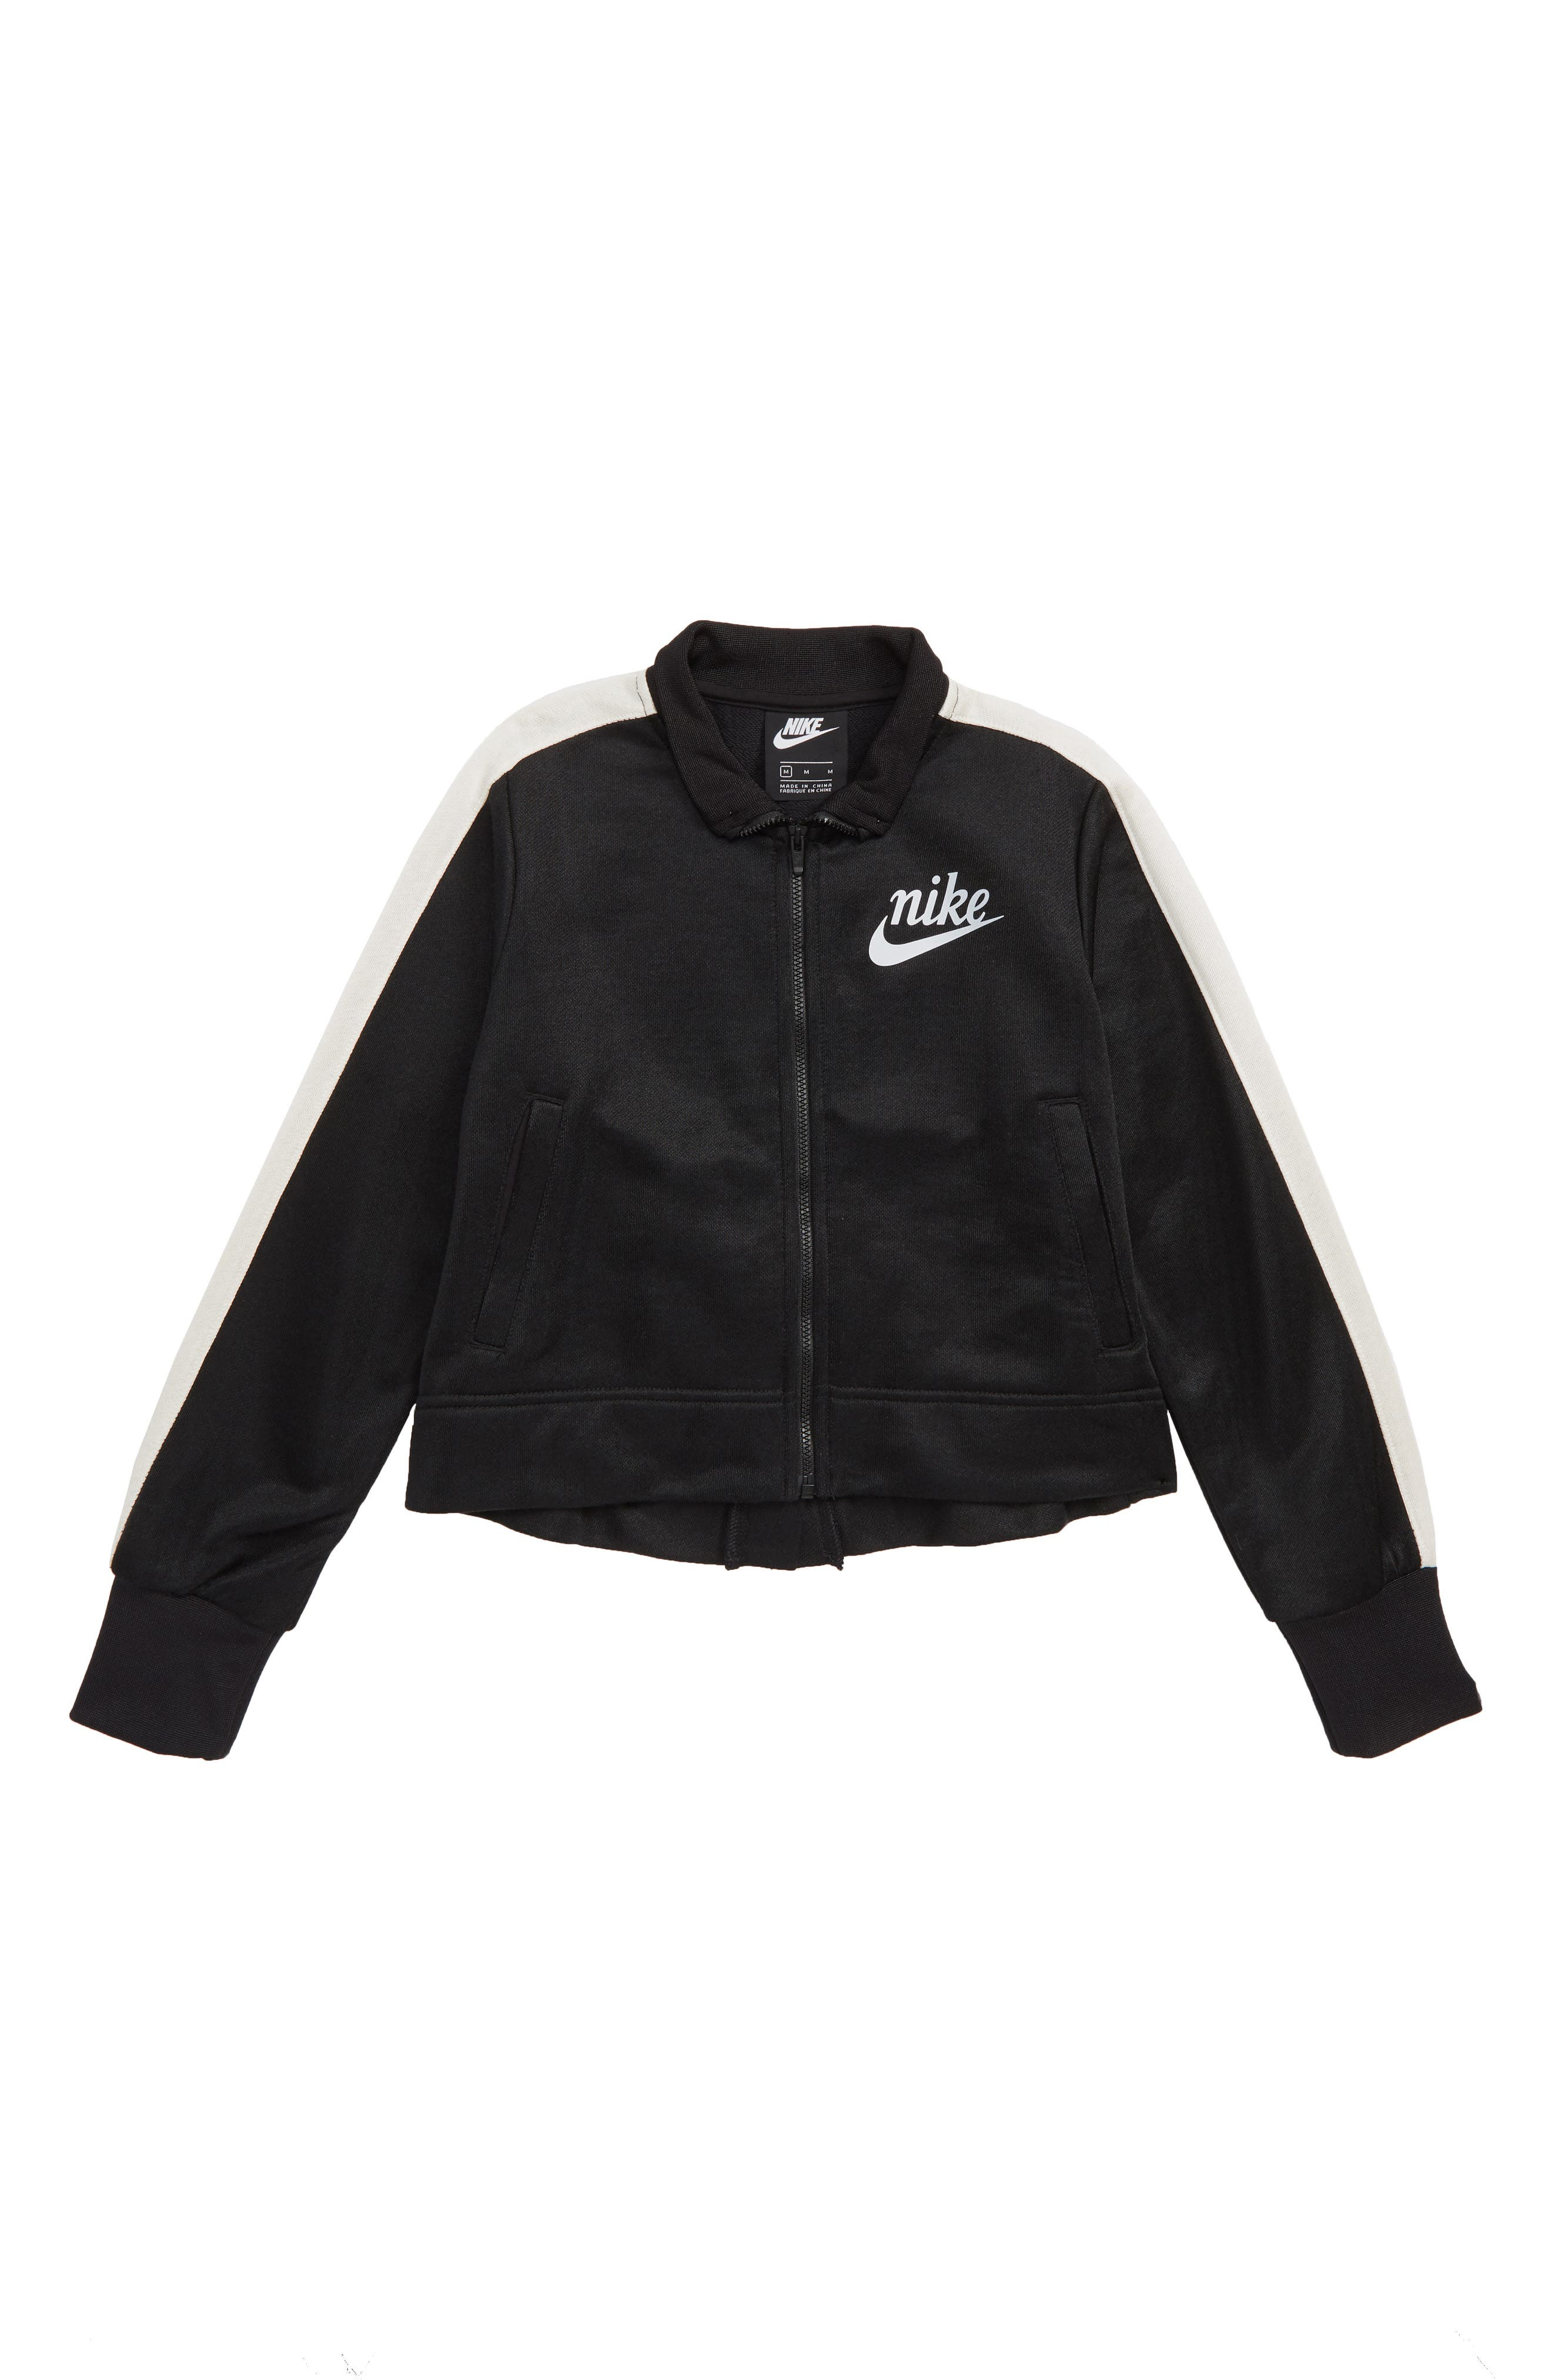 NIKE, Icon Shiny Crop Track Jacket, Main thumbnail 1, color, BLACK/ PALE IVORY/ SILVER